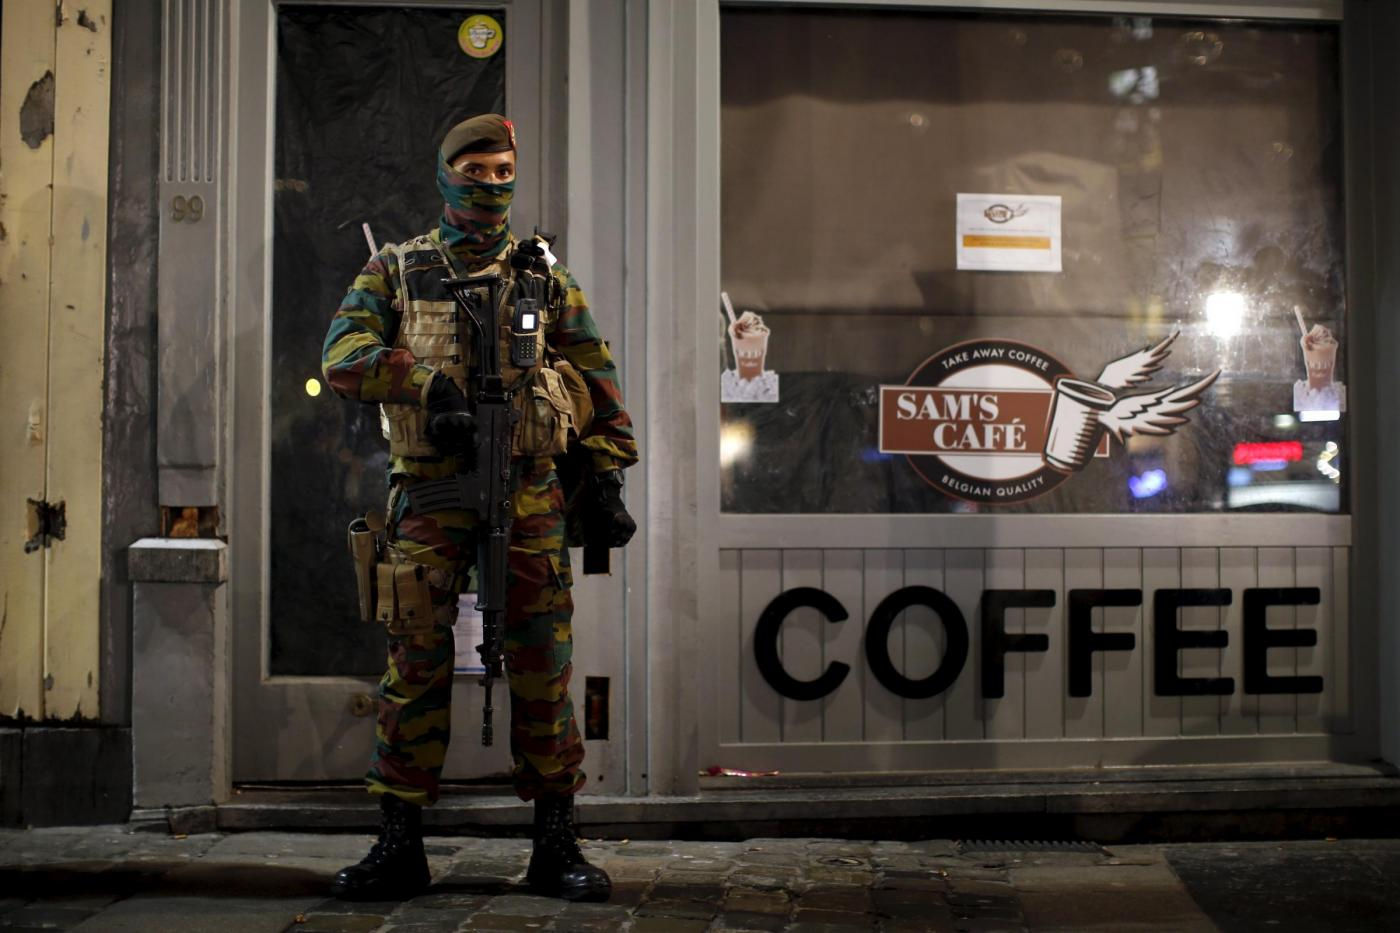 Bruxelles resta blindata: allerta terrorismo sempre massima